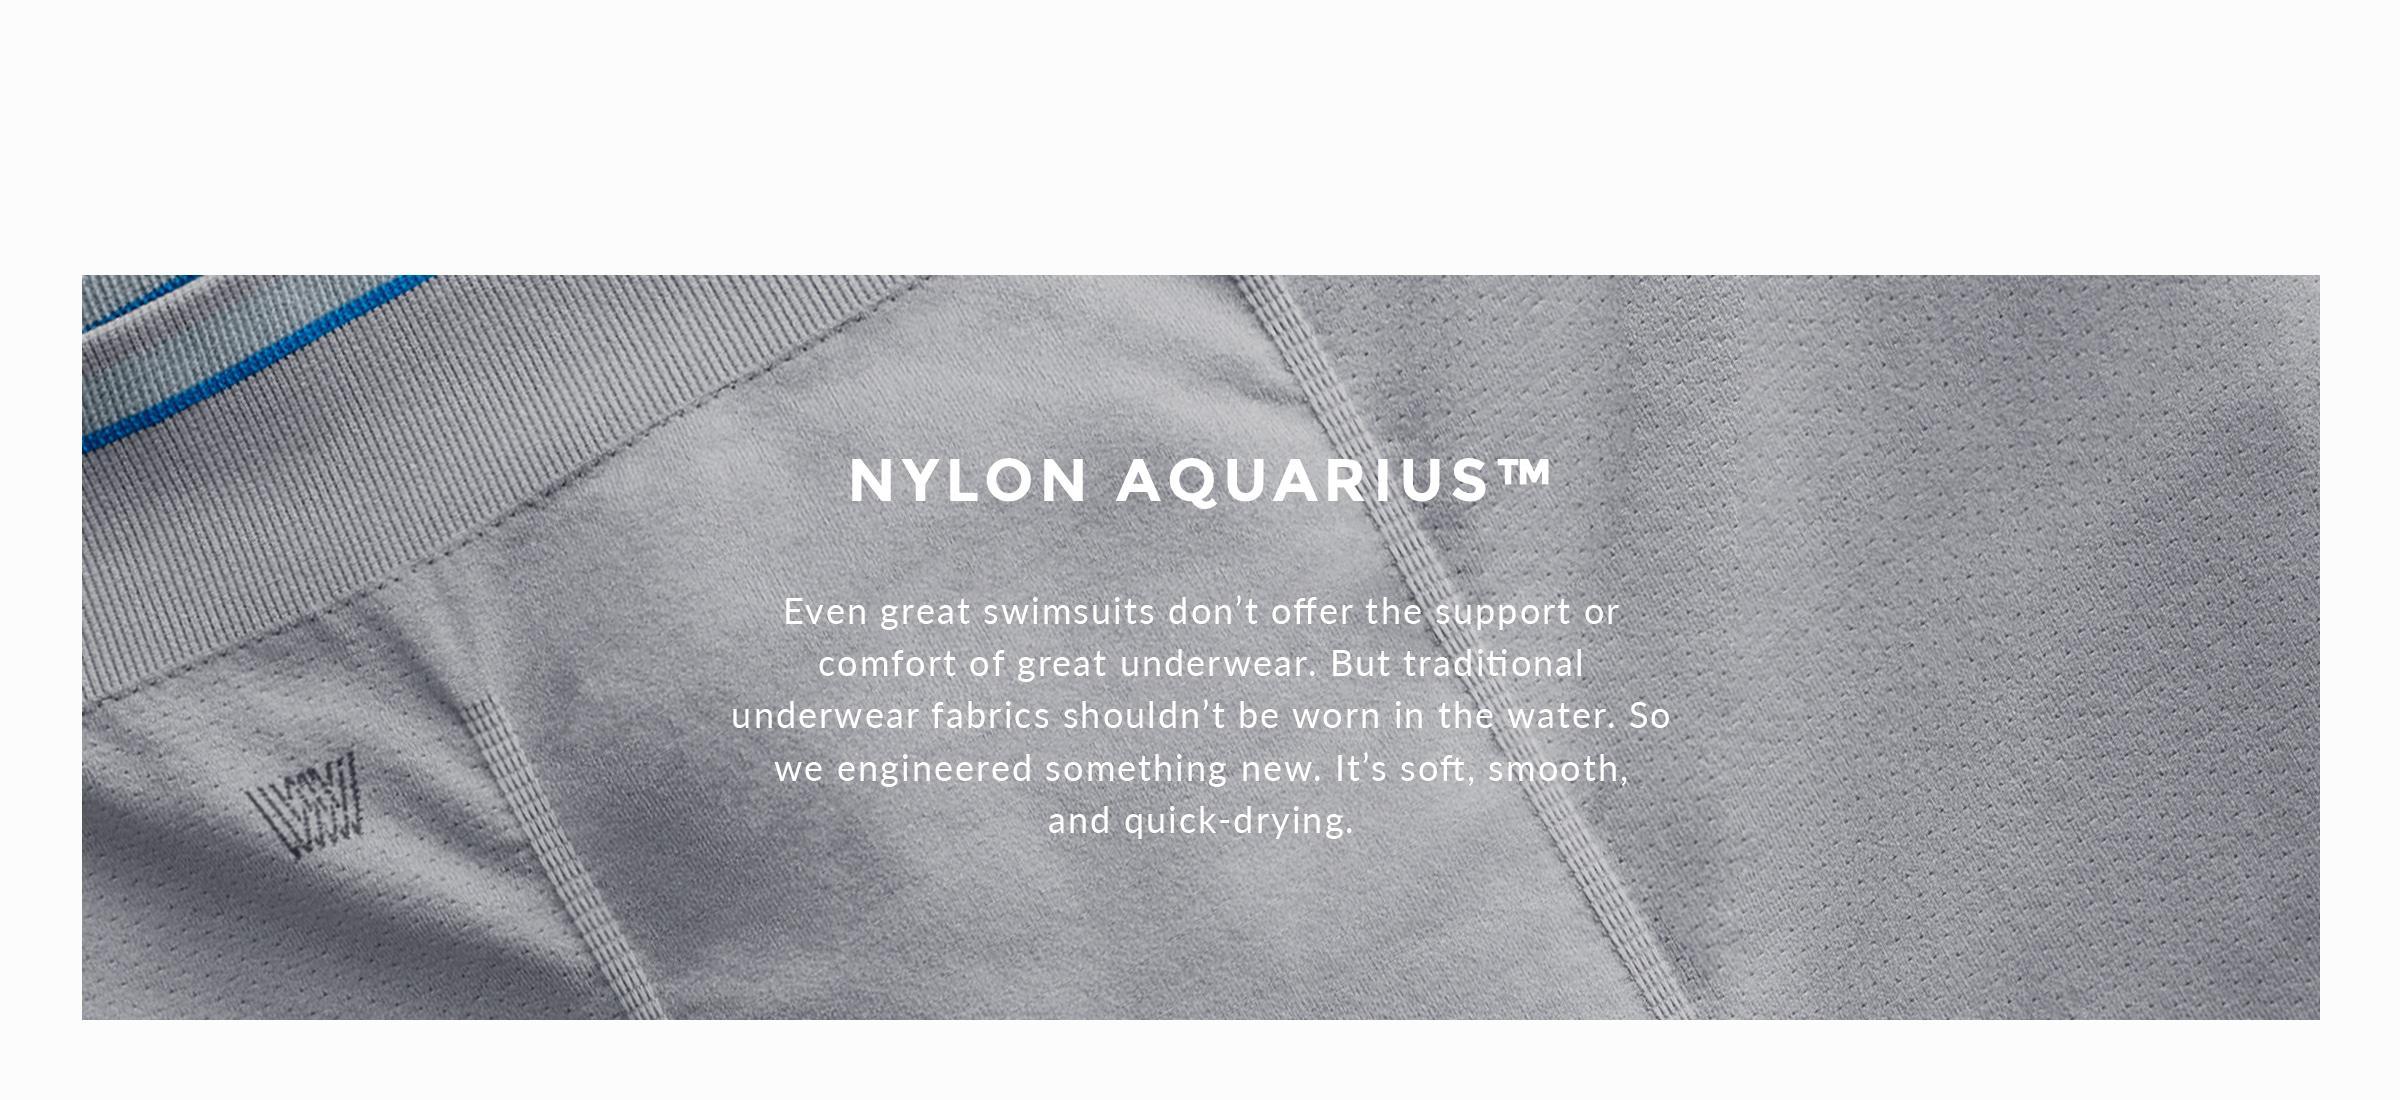 d20de2dc2d8f8 Mack Weldon | Men's Amphibious Swim Underwear - Smooth, quick-drying ...